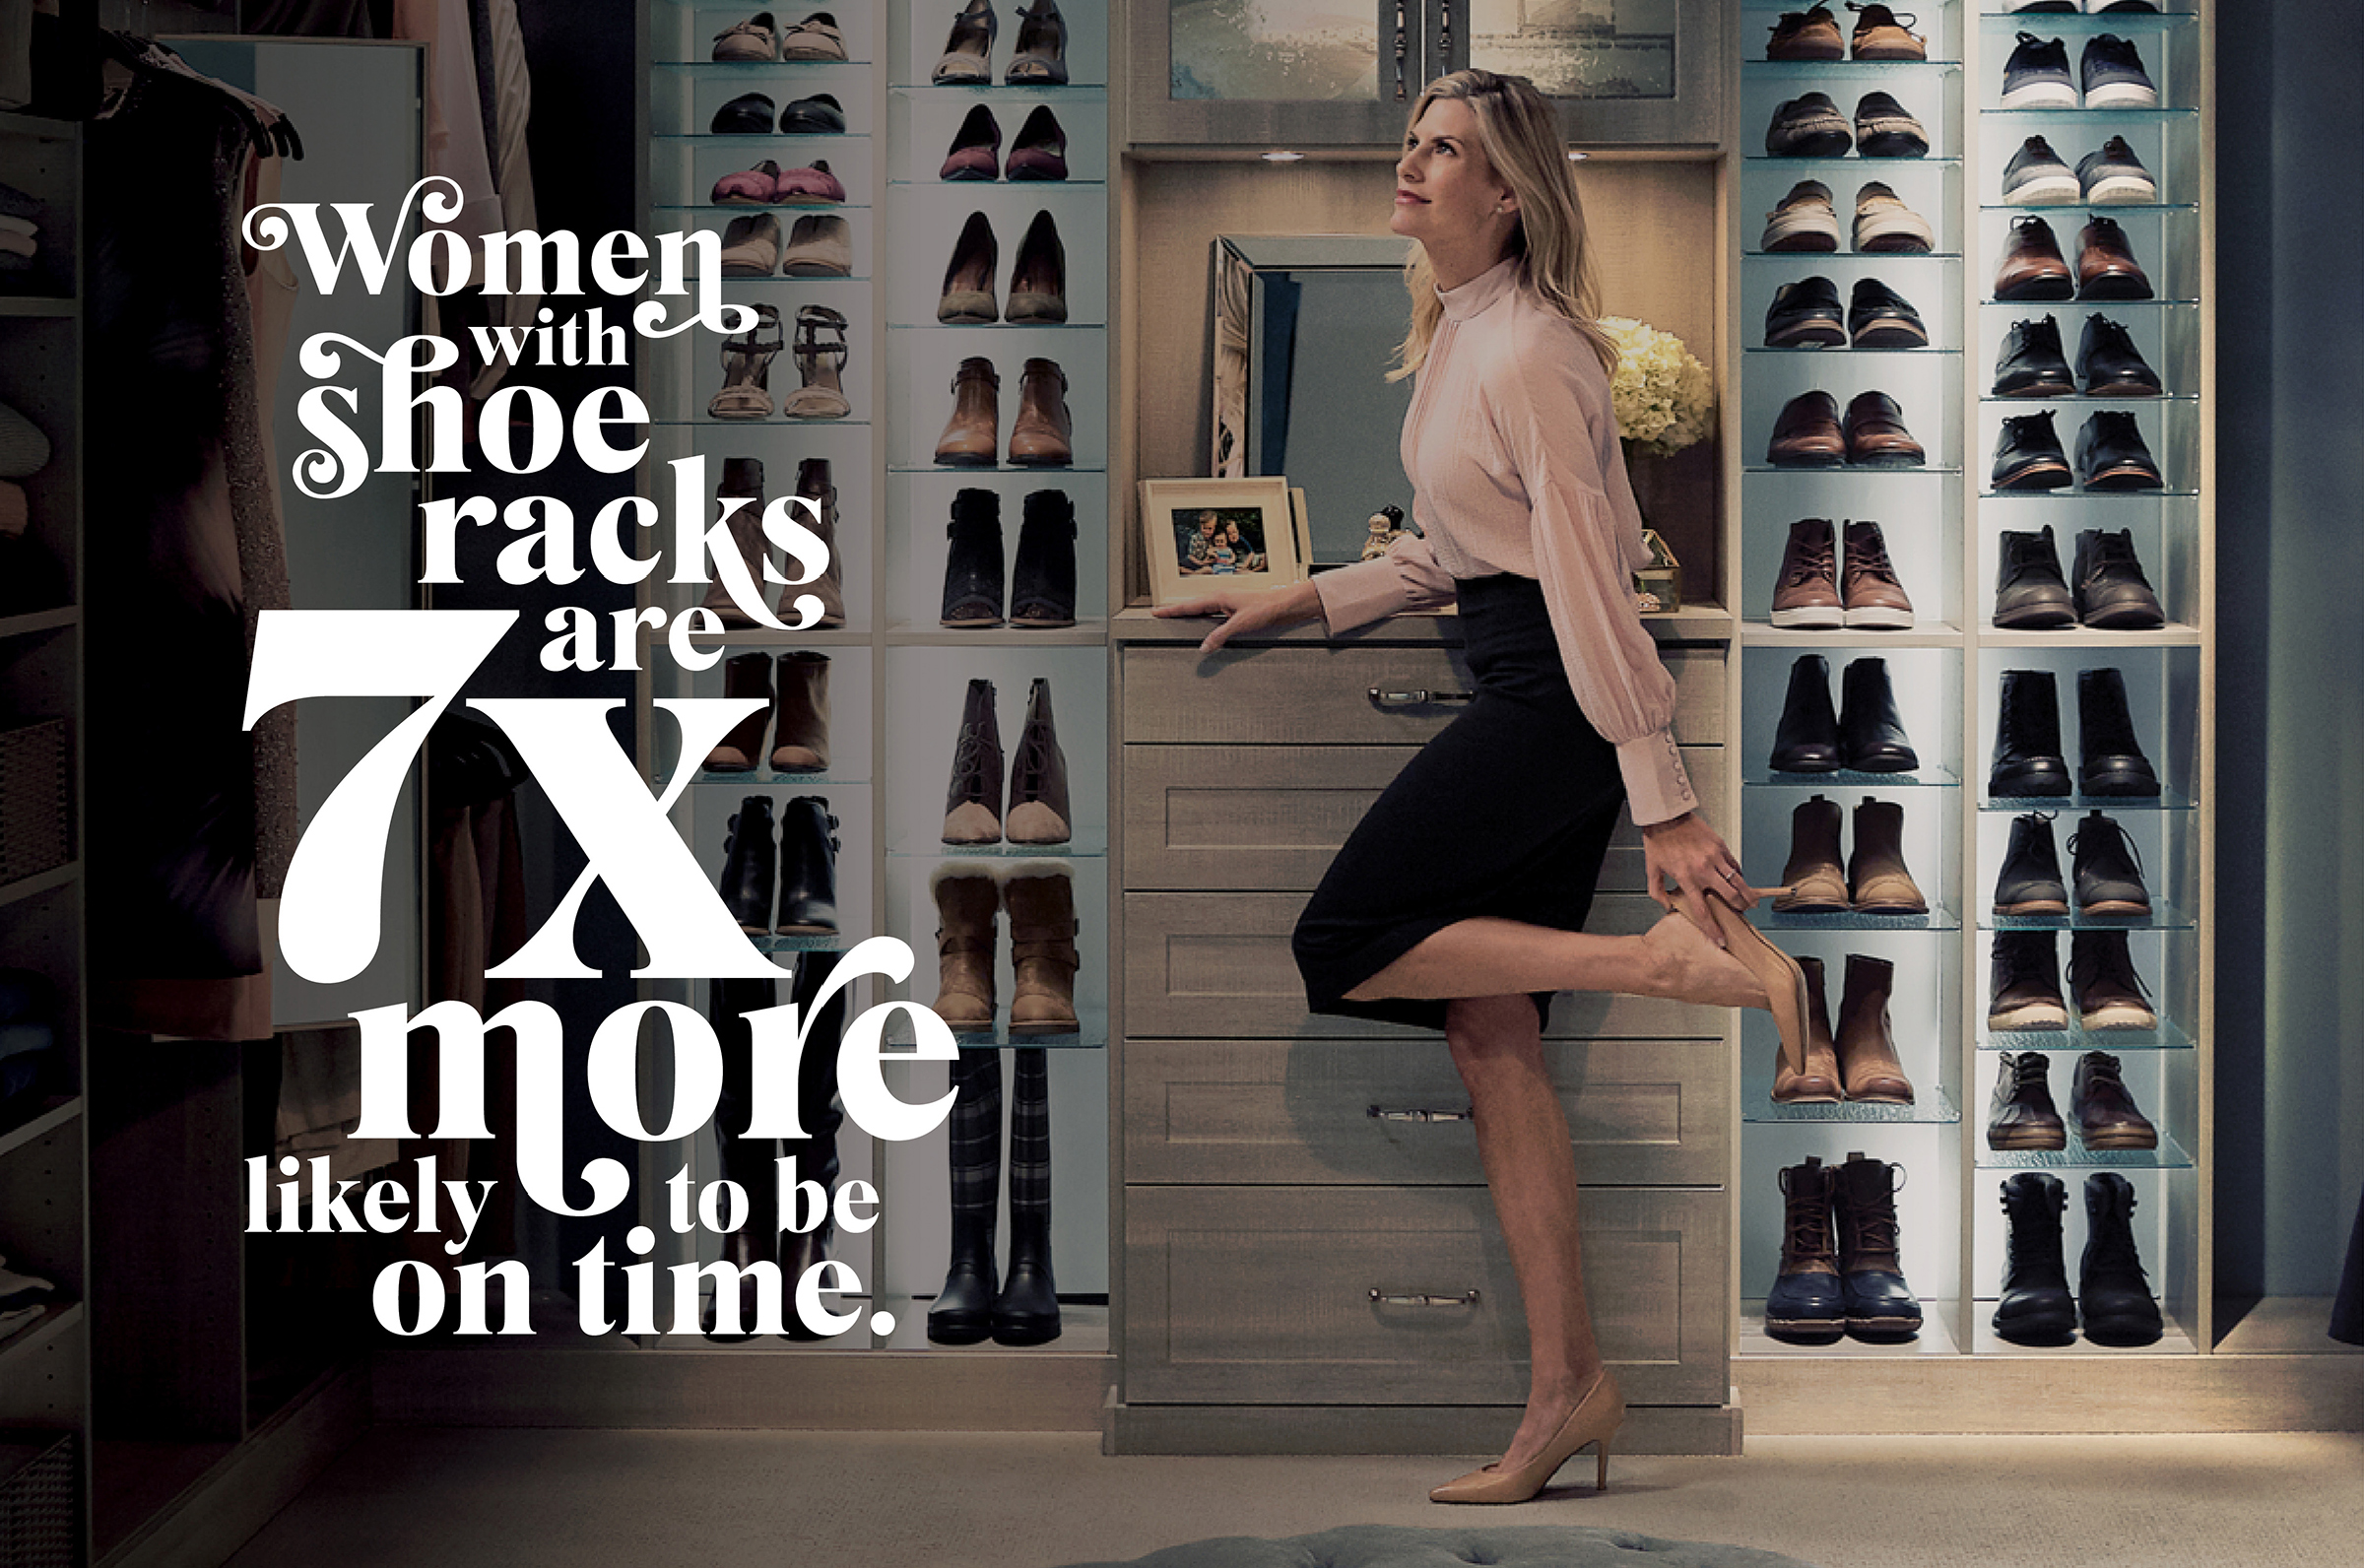 Proper shoe storage save time